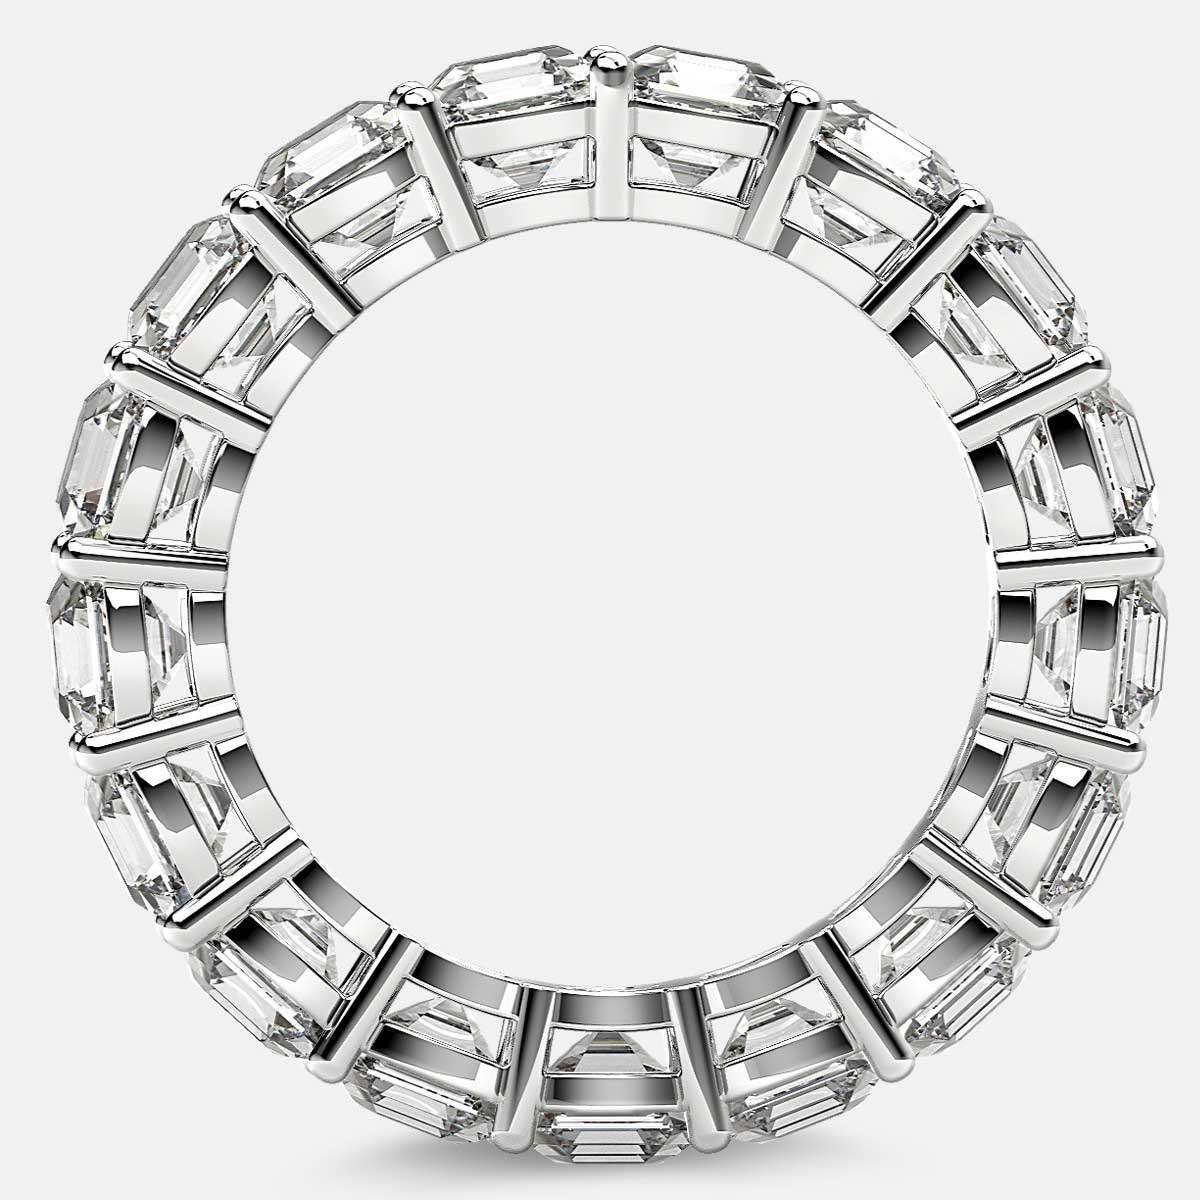 Eternity Ring with Prong Set Asscher Cut Diamonds in Platinum